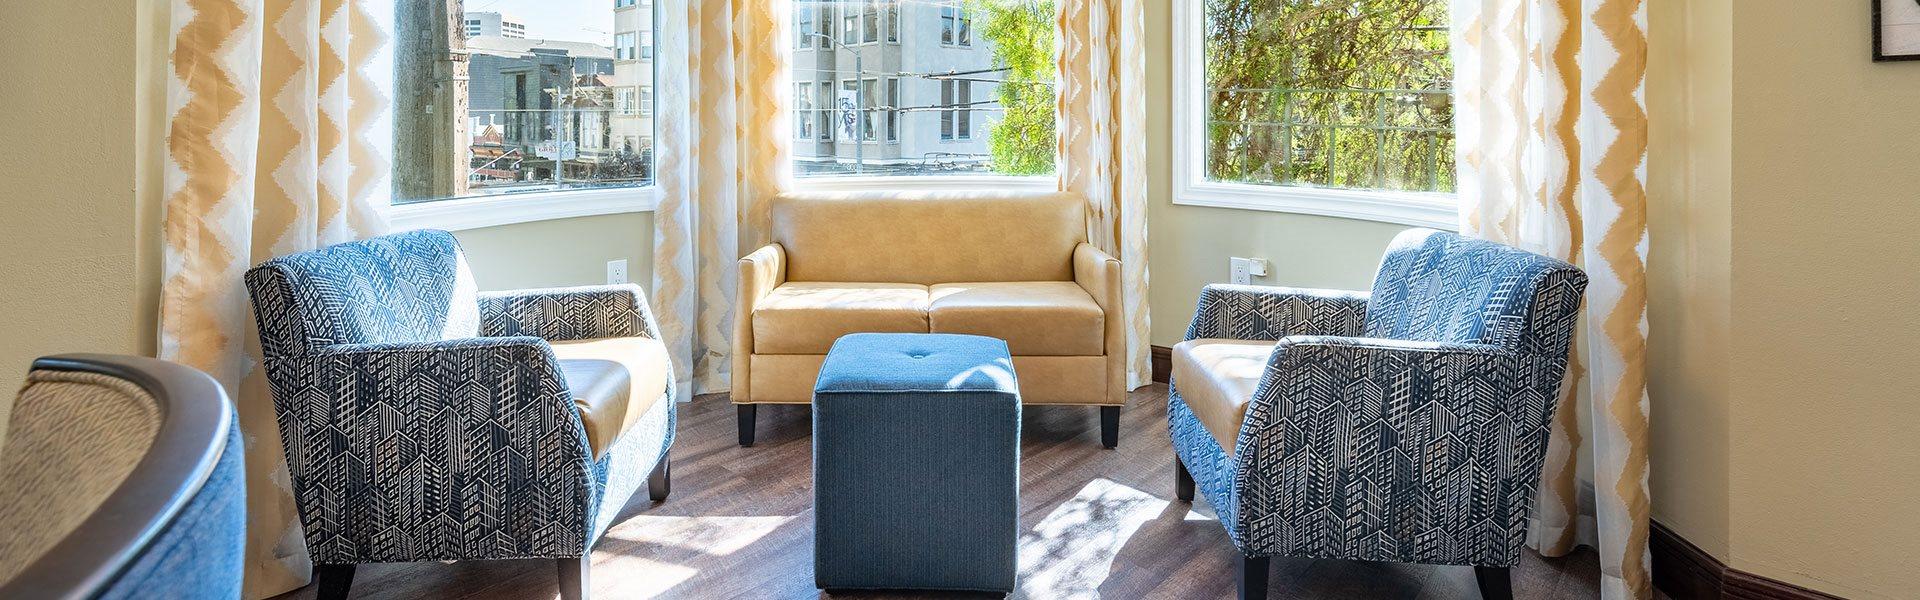 Extra Comfortable Sofa Chair at The Village at Hayes Valley, San Francisco, CA, 94102